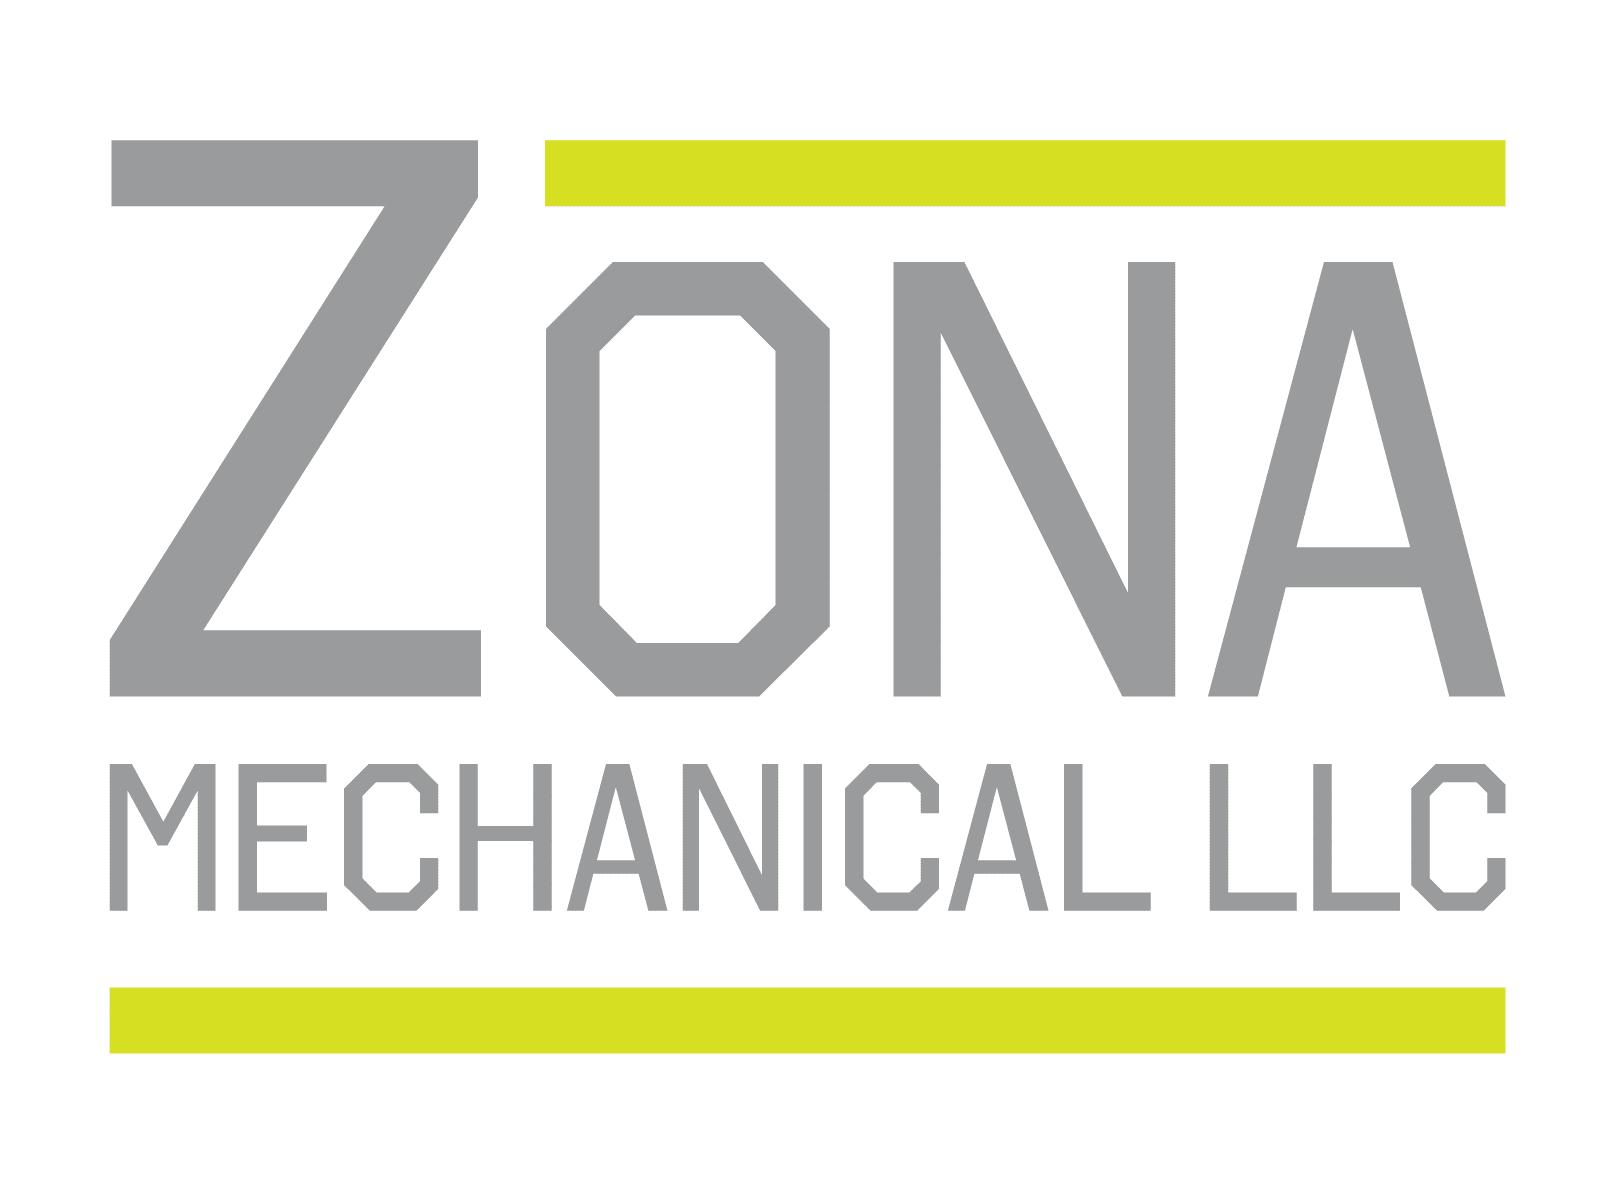 Zona Mechanical LLC logo